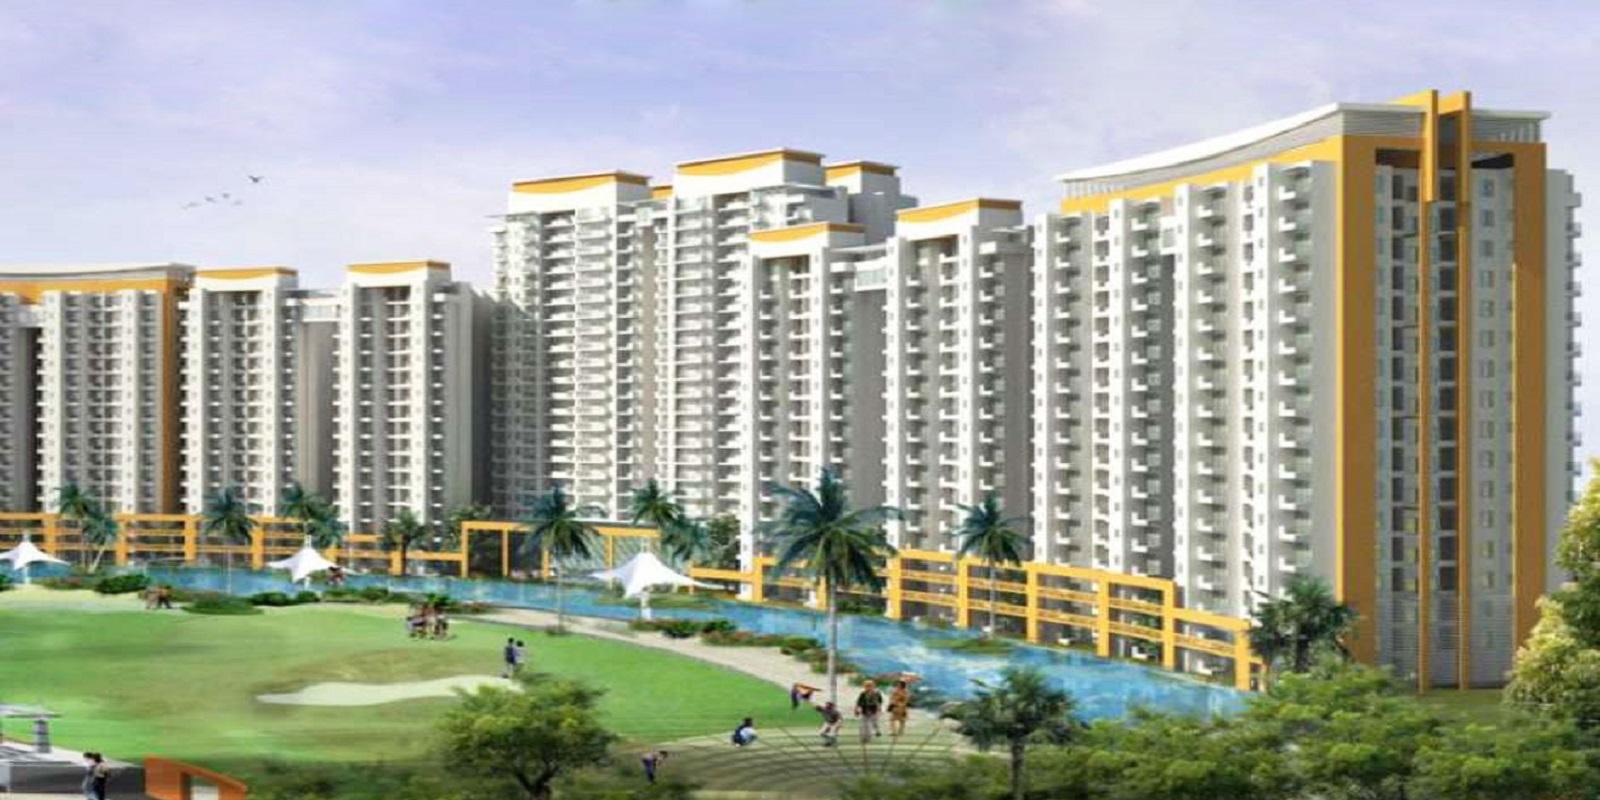 gaur city 2 14th avenue project large image1